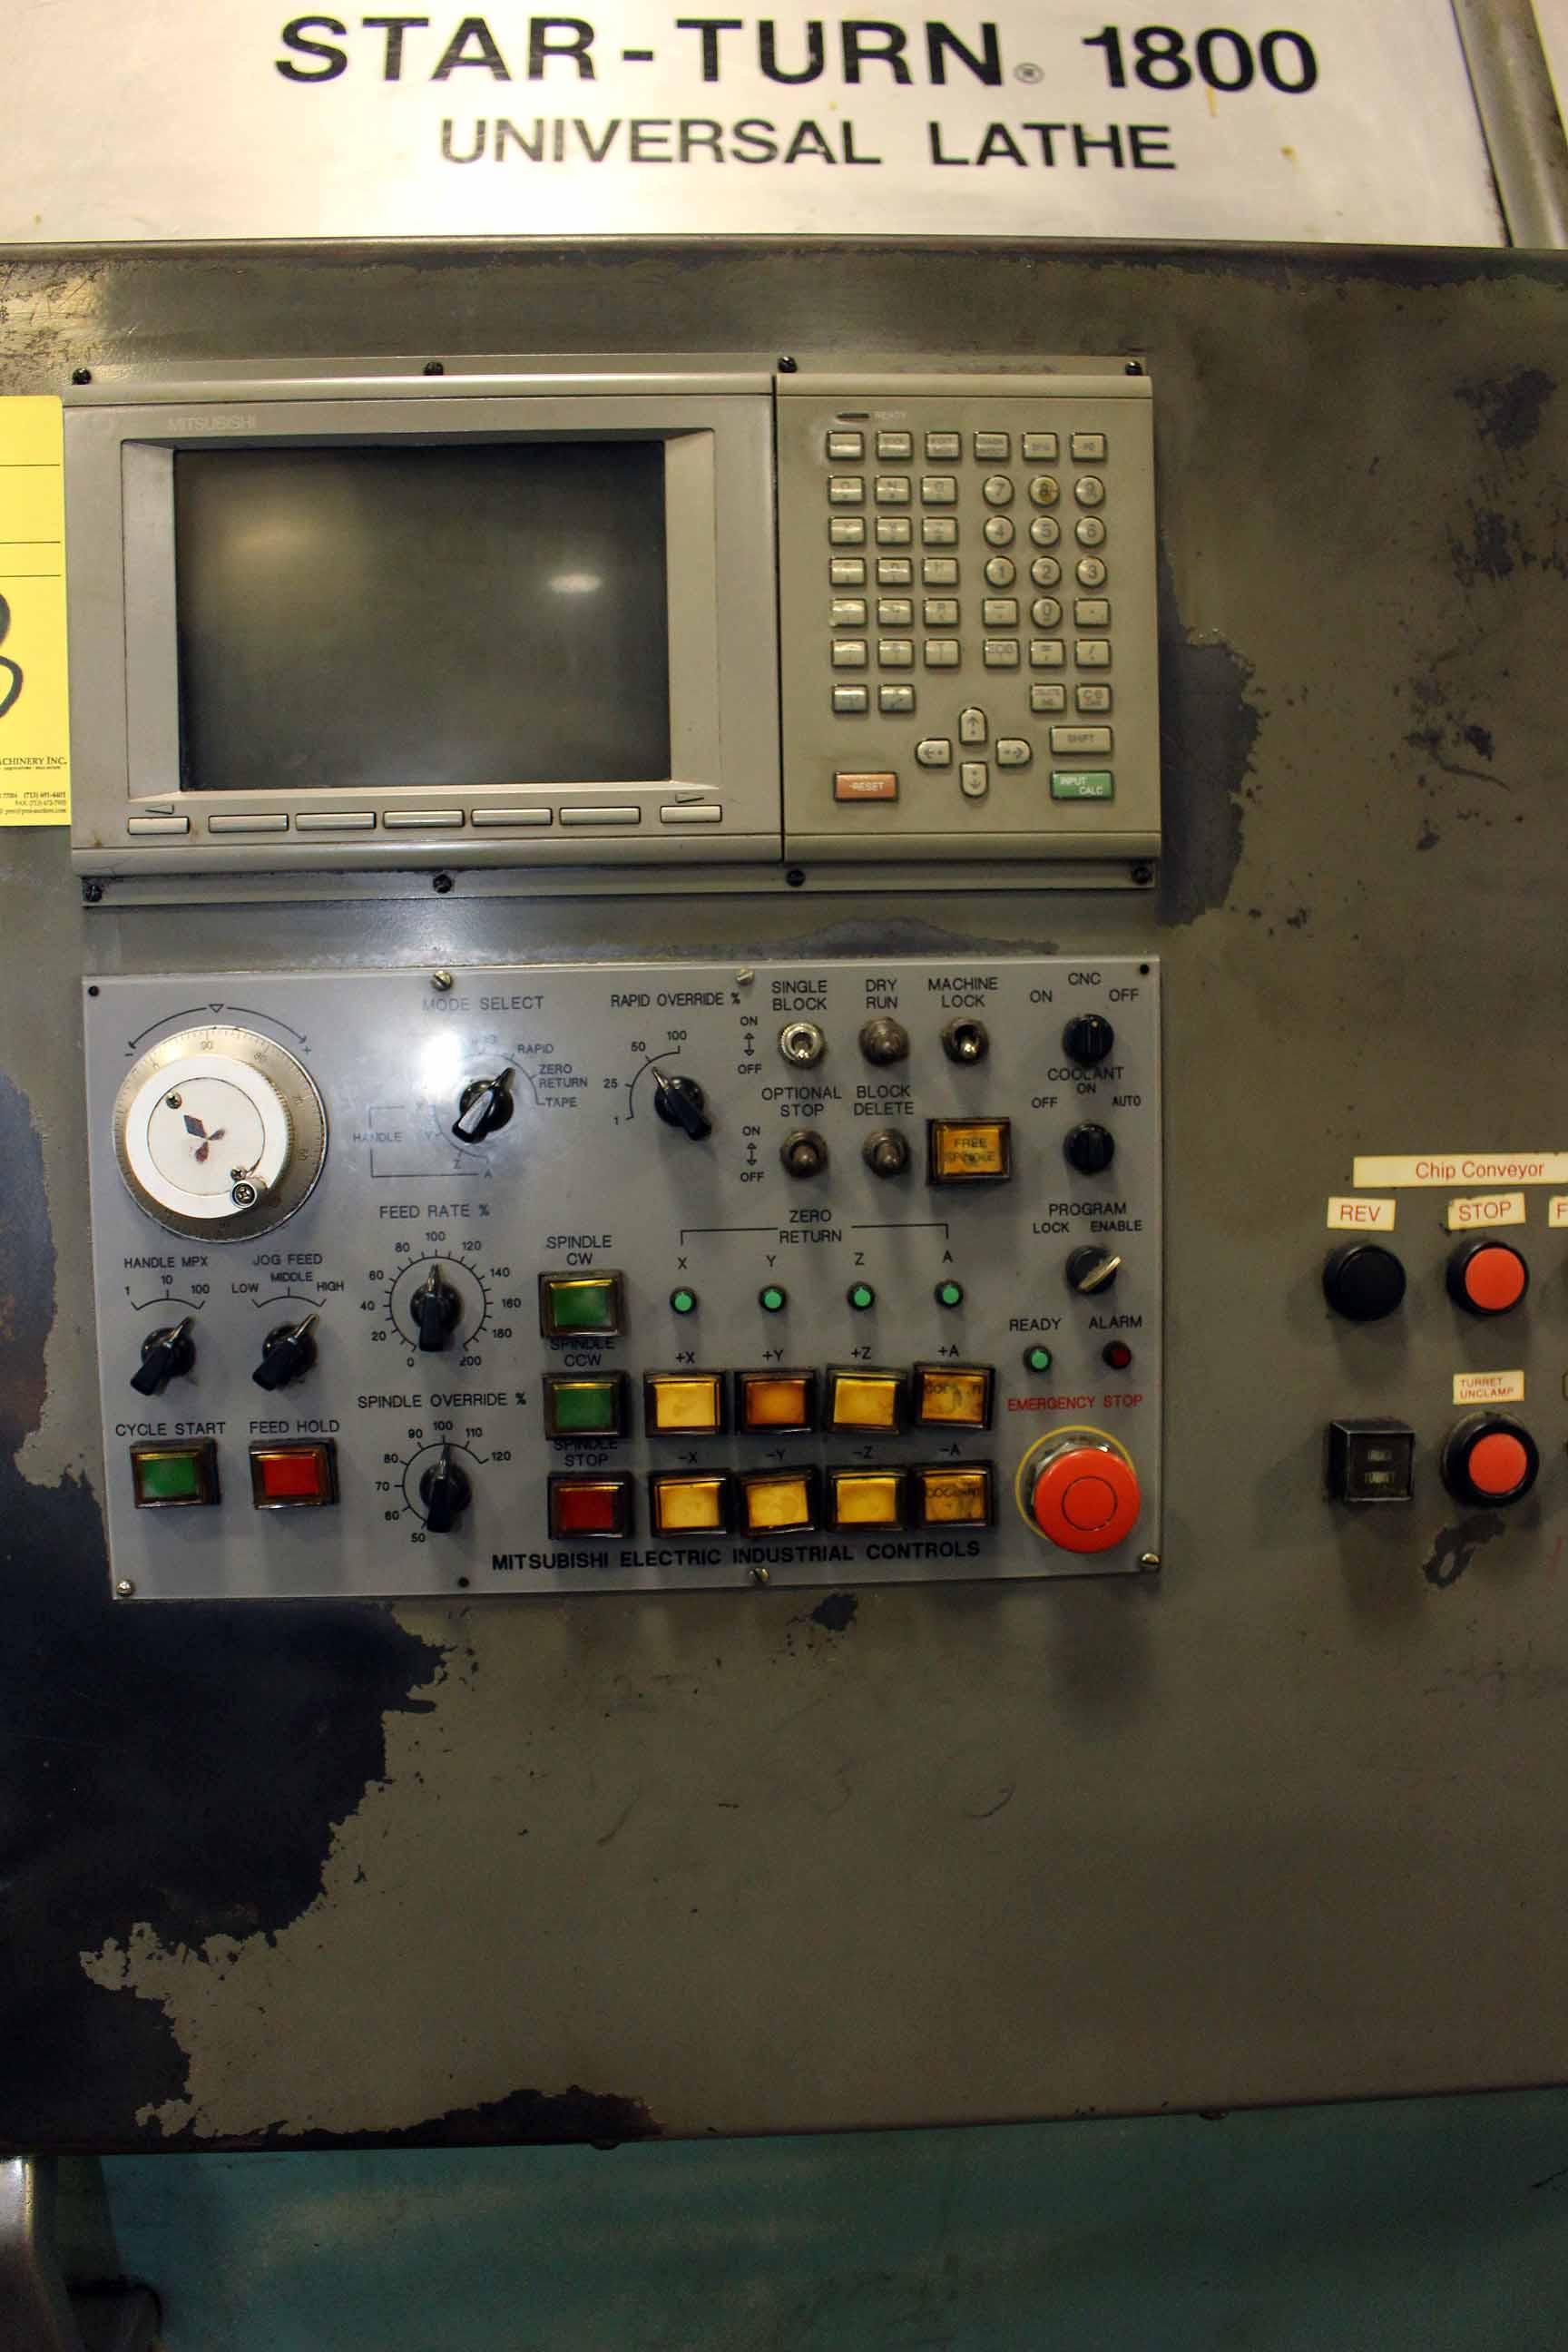 Lot 8 - CNC CHUCKER, PRATT & WHITNEY MDL. STARTURN 1800, Mitsubishi Meldas 50 (M50) Series CNC control,